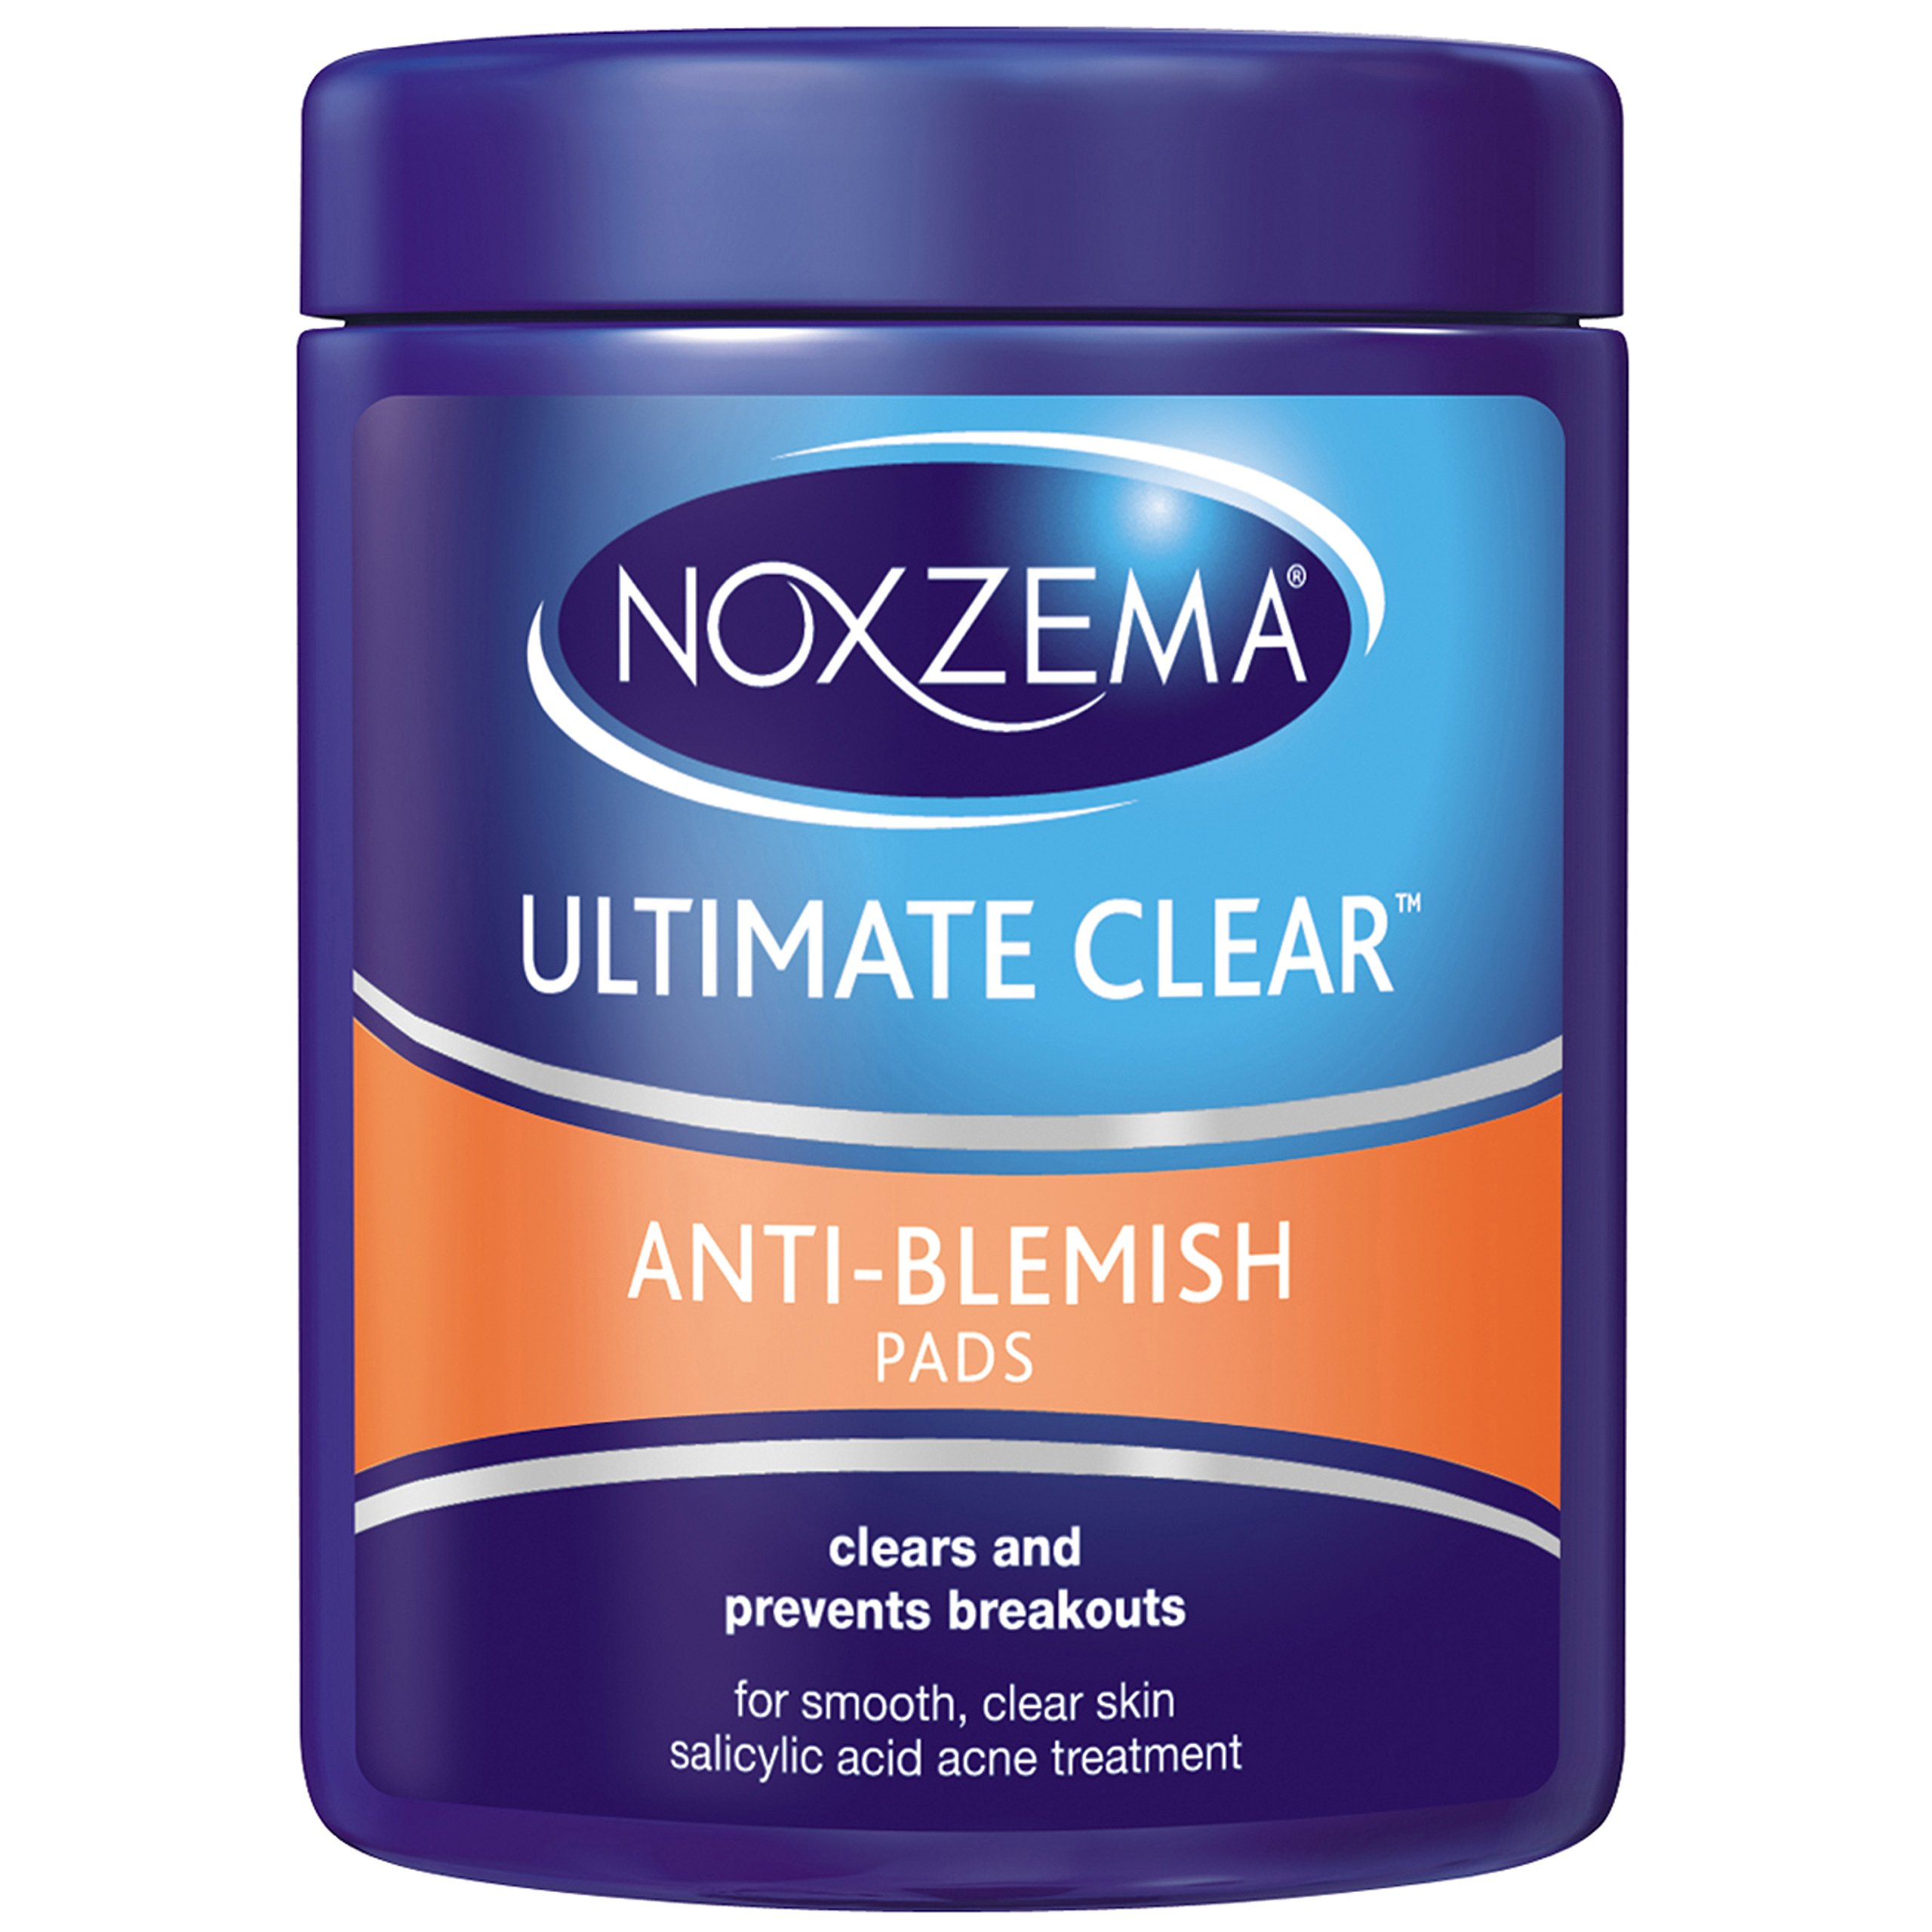 Noxzema Ultimate Clear Pads Anti Blemish, 90 ct